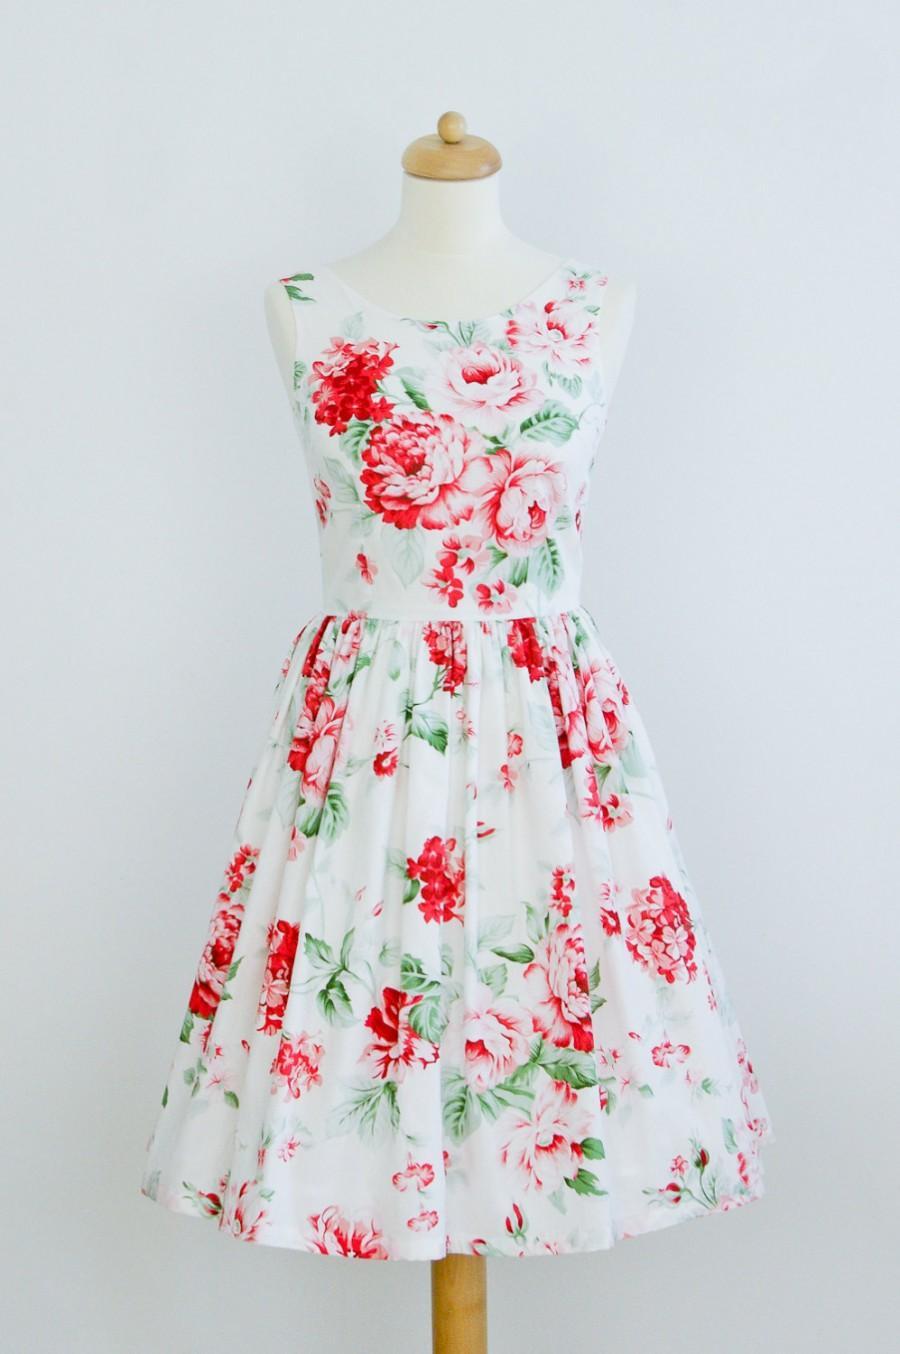 Wedding - Custom made bridesmaid dress, cotton dress, floral dress, vintage inspired dress